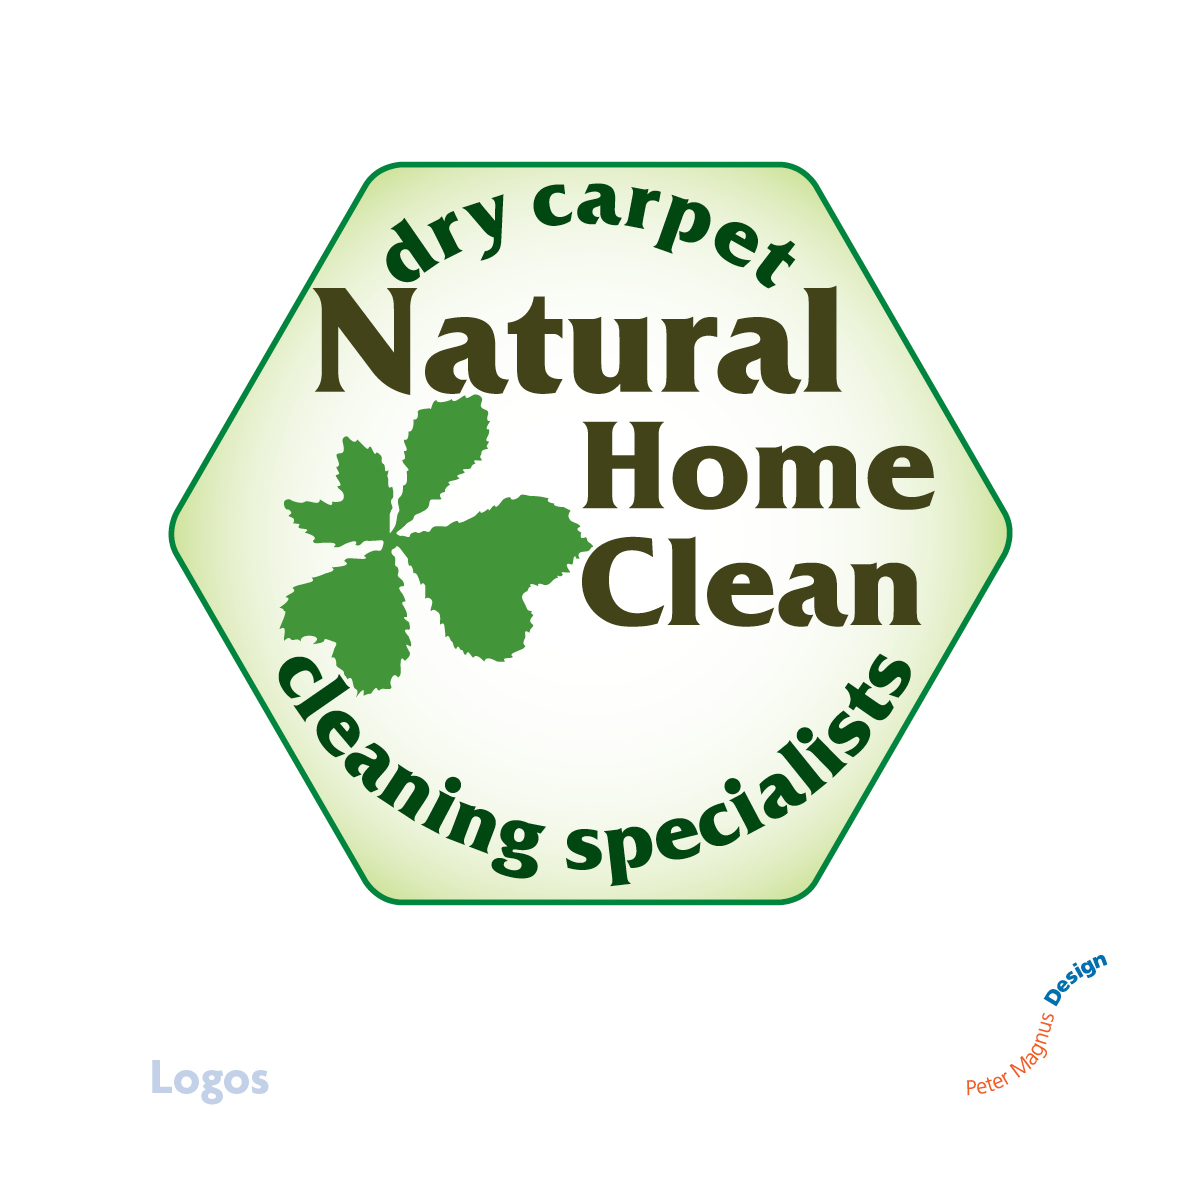 Natural Home Clean logo, Watford, Herts